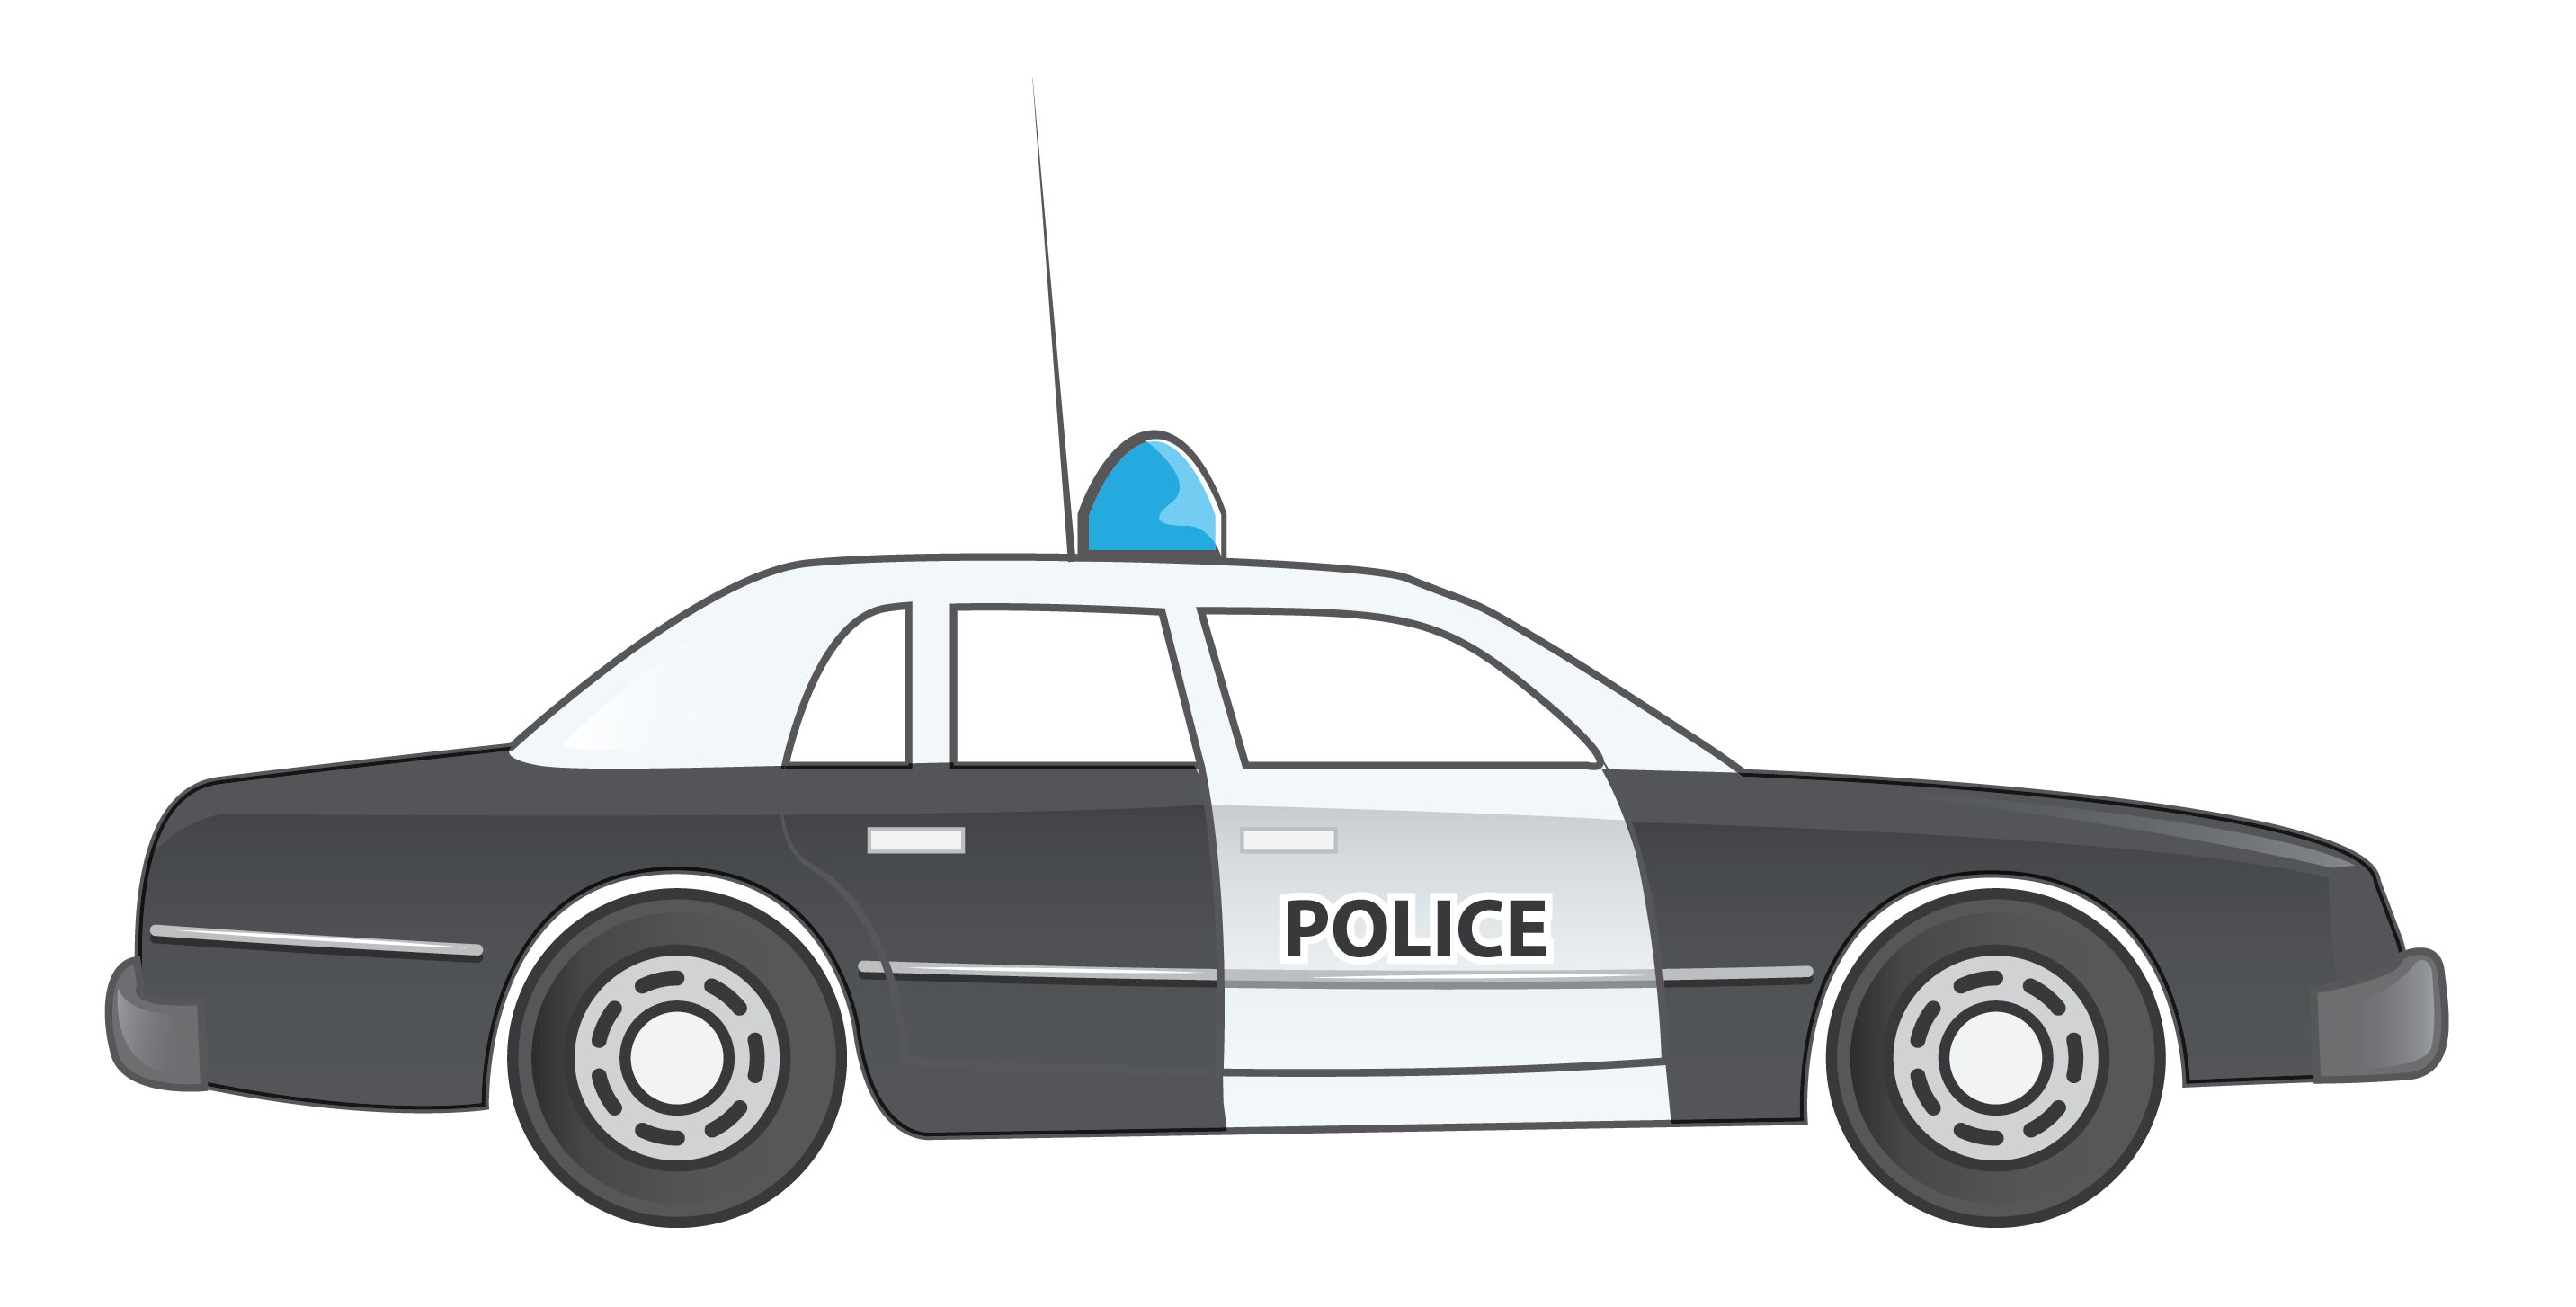 Free Police Car Clip Art